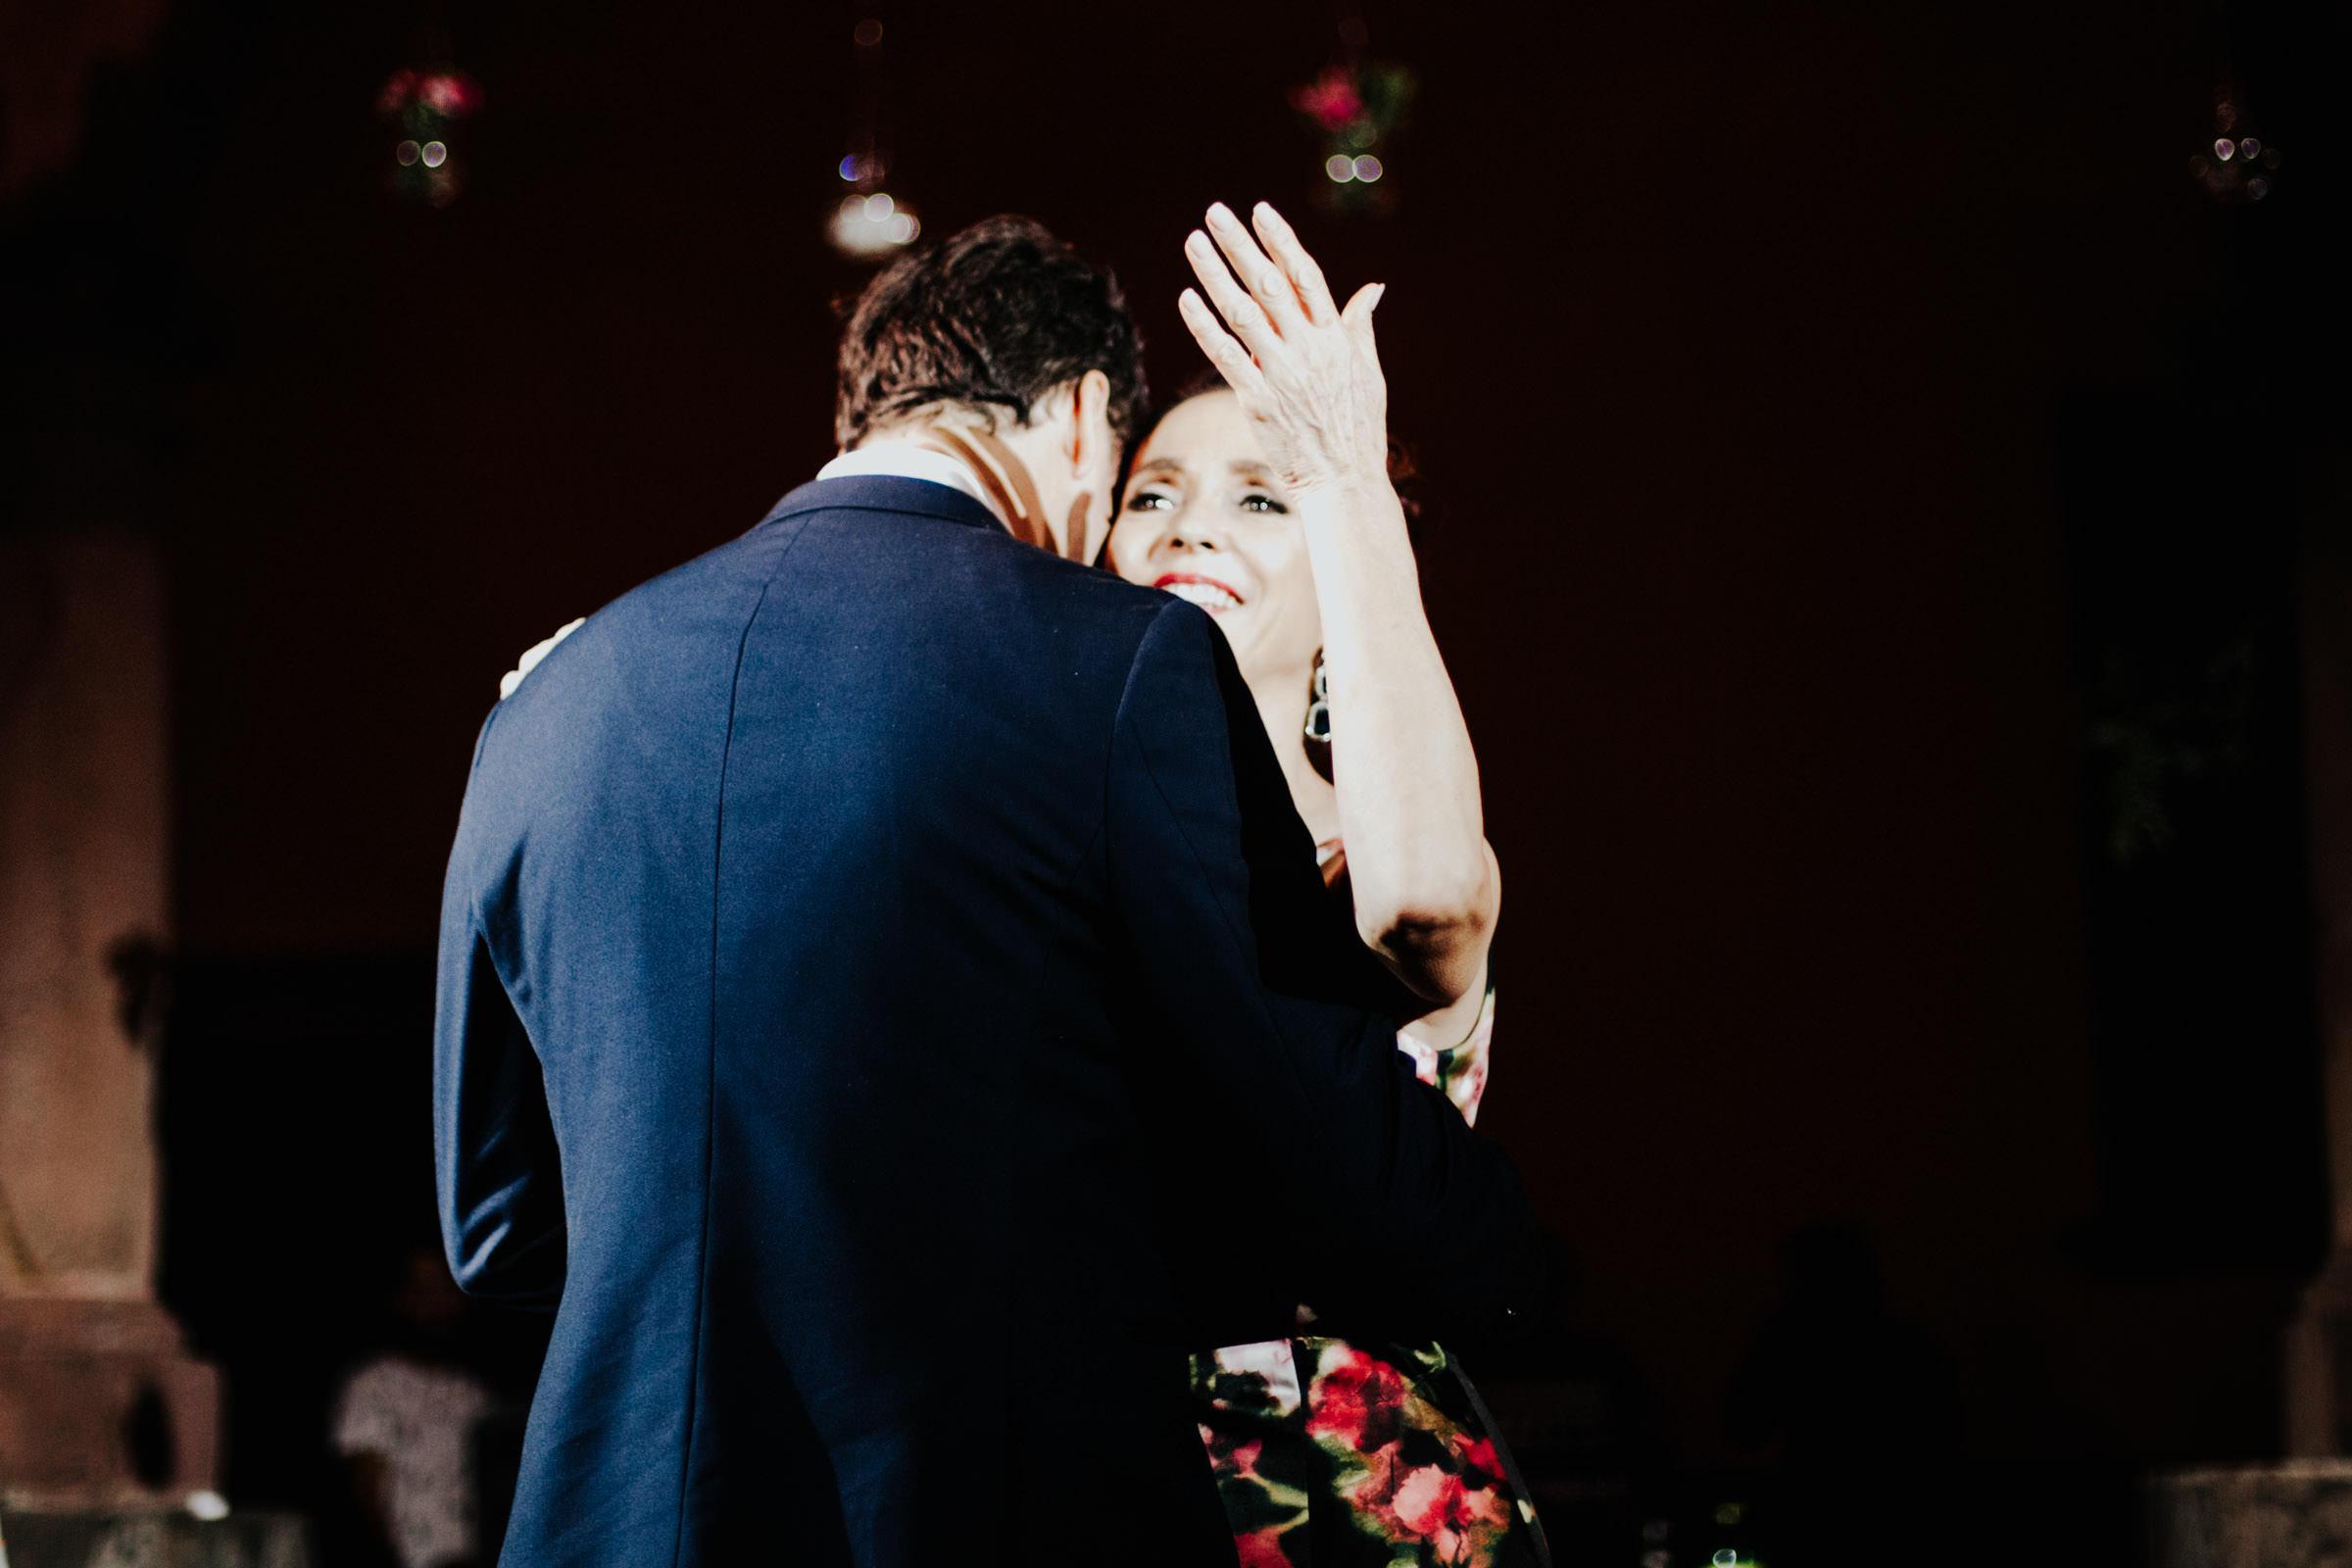 San-Miguel-de-Allende-Wedding-Photography-Parroquia-Instituto-Boda-Fotografia-Fer-Sergio-Pierce-Lifestyle-Photography0028.JPG